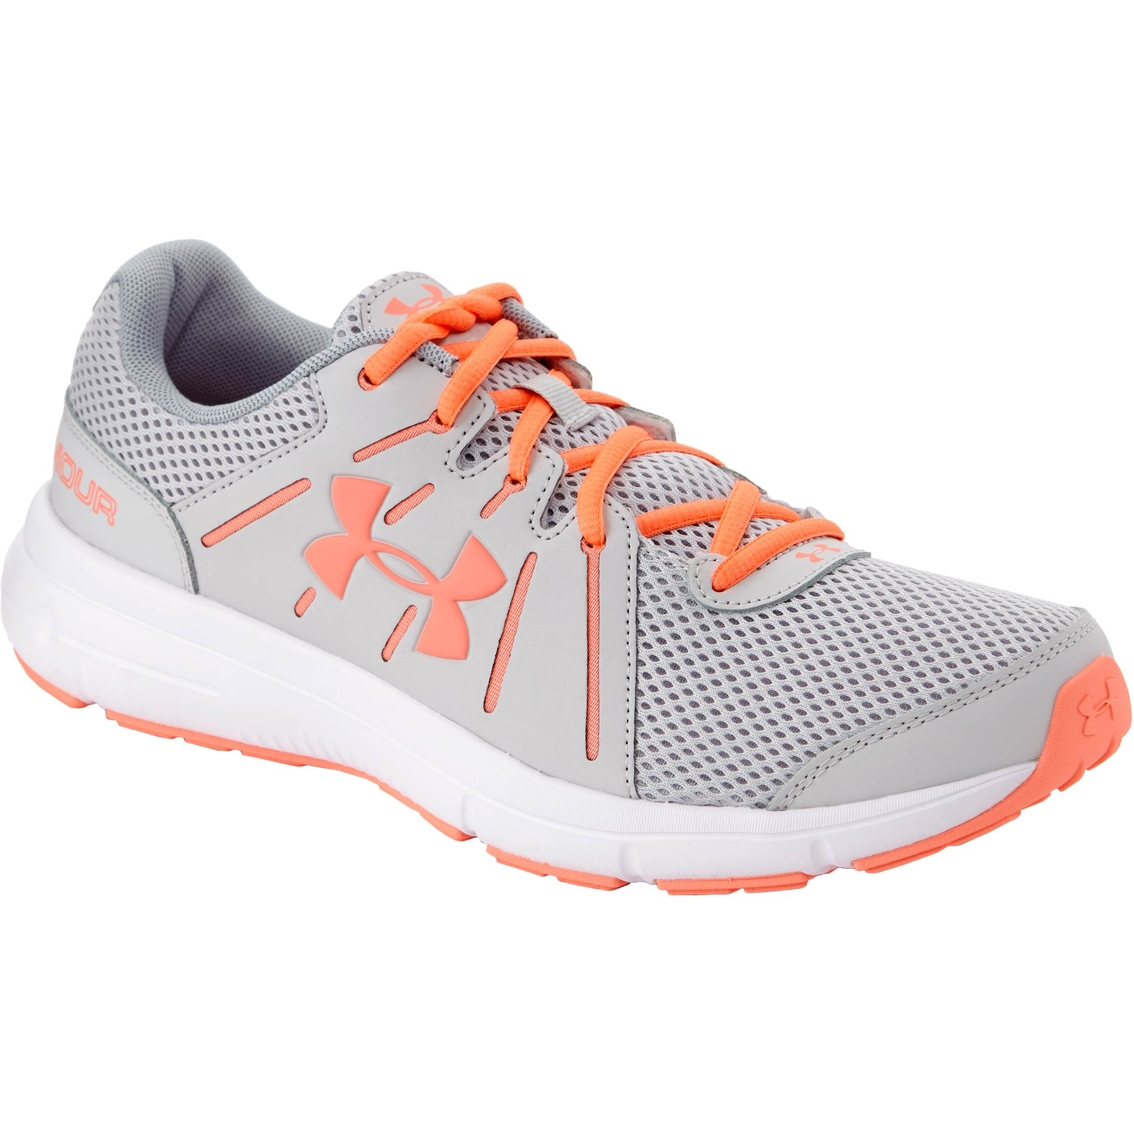 Under Armour Women's Dash RN 2 Running Shoes